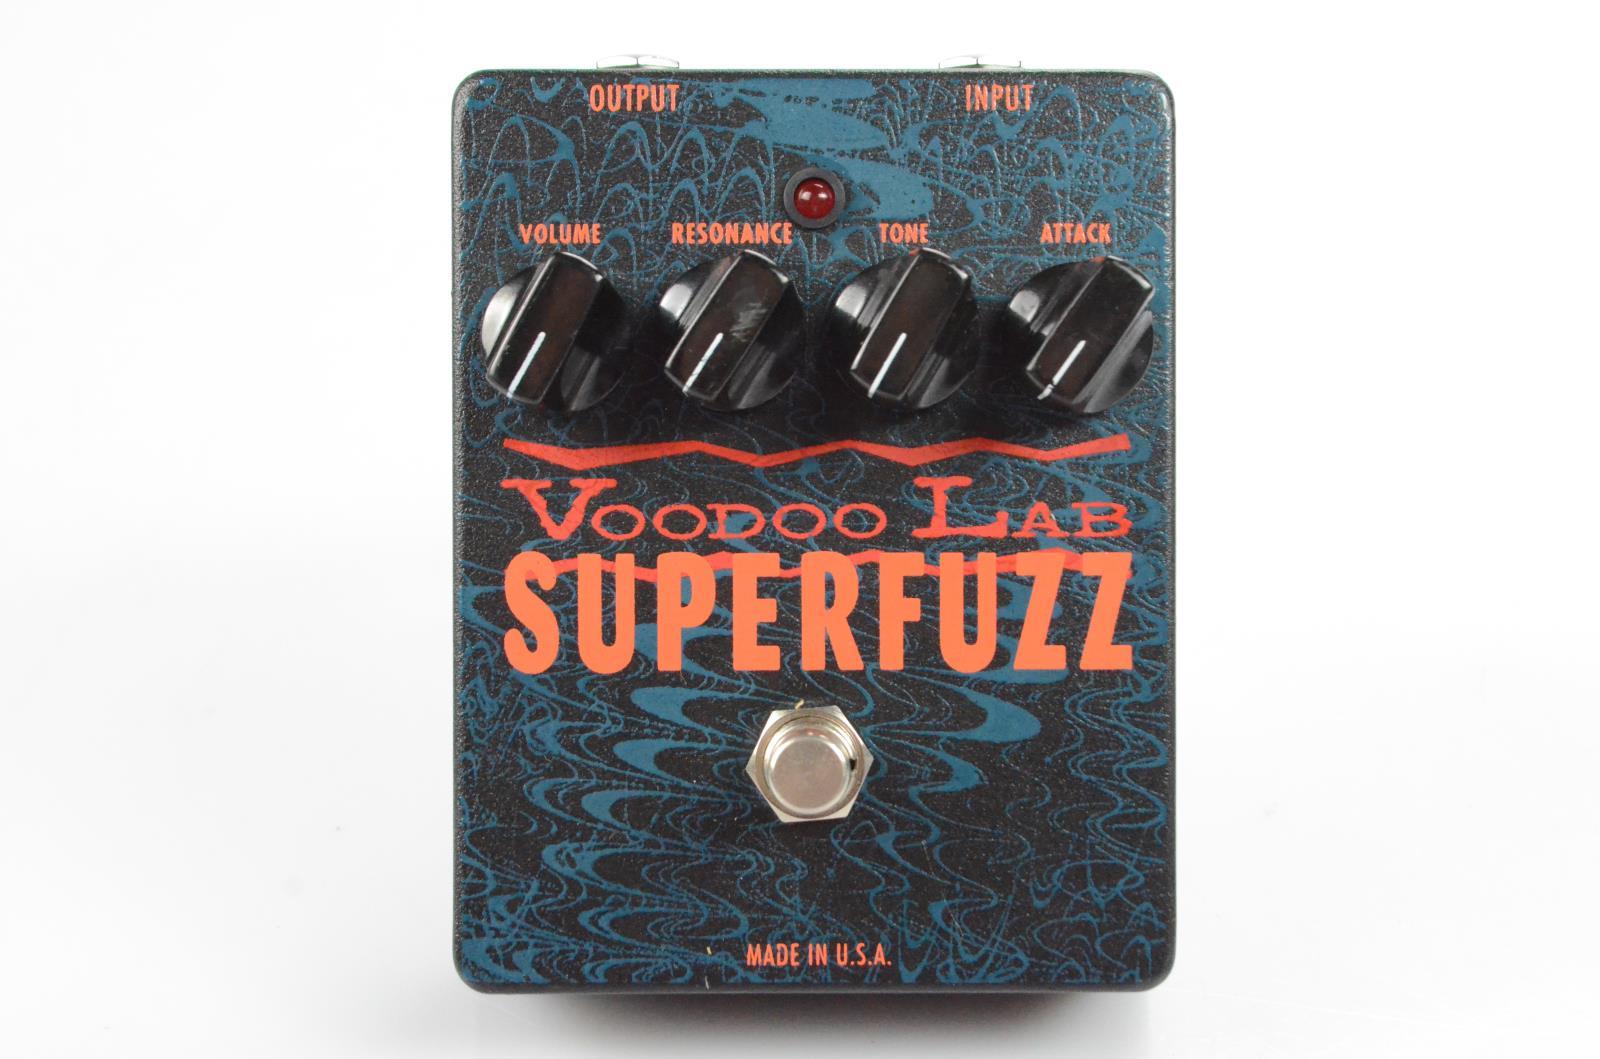 Voodoo Lab Superfuzz Super Fuzz Distortion Guitar Effect Pedal #33917